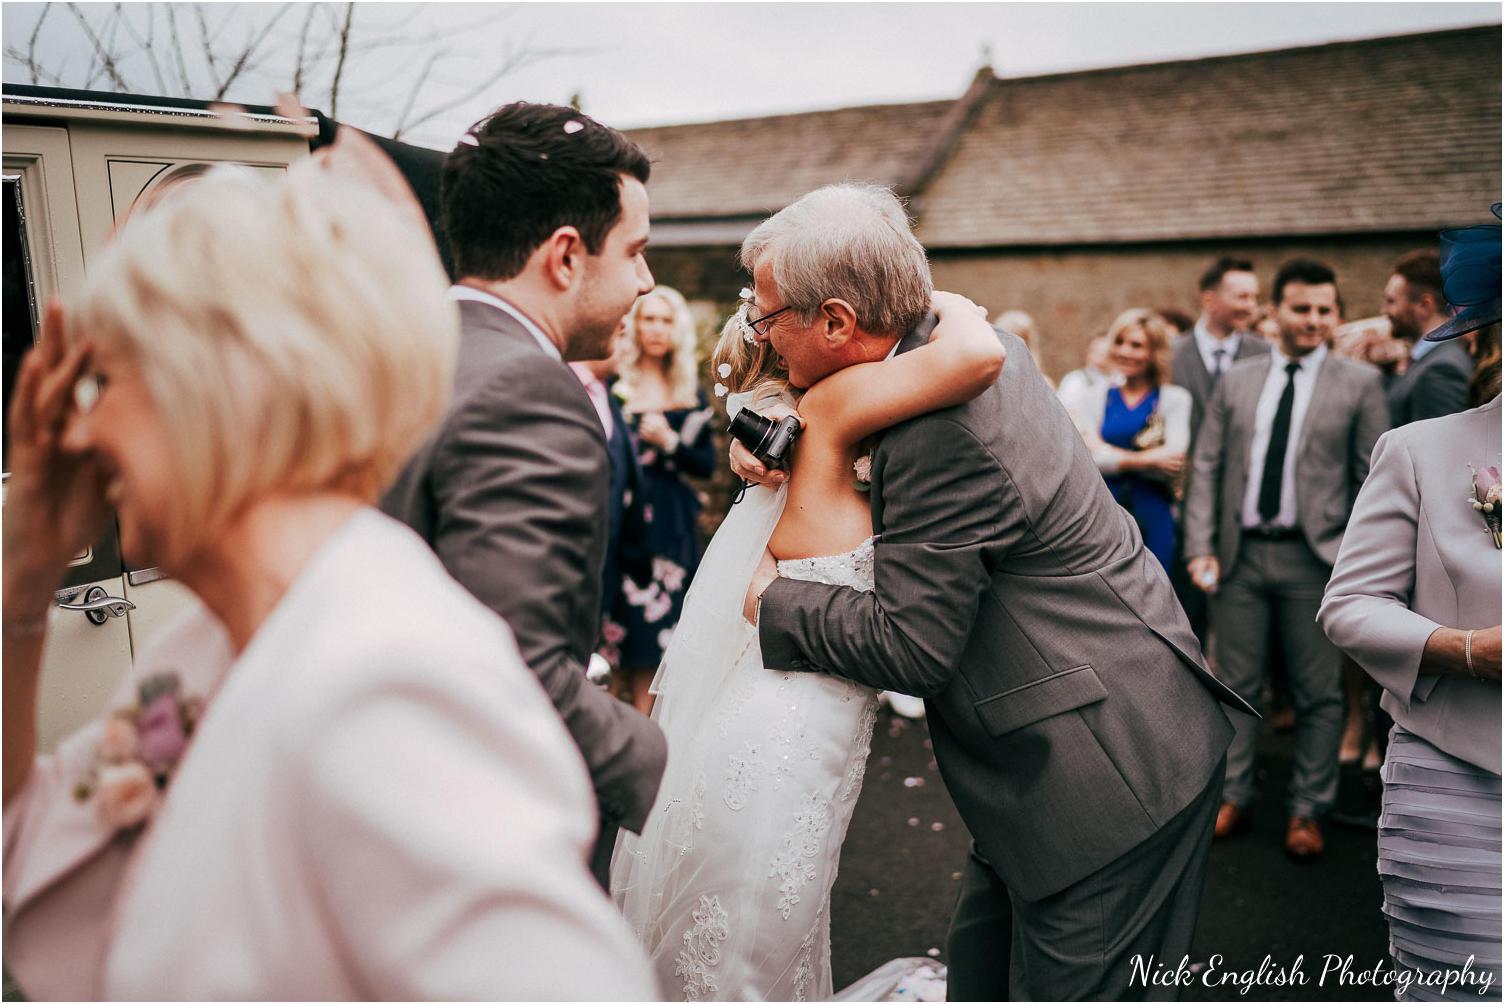 Mitton_Hall_Wedding_Photographer_2018-87.jpg